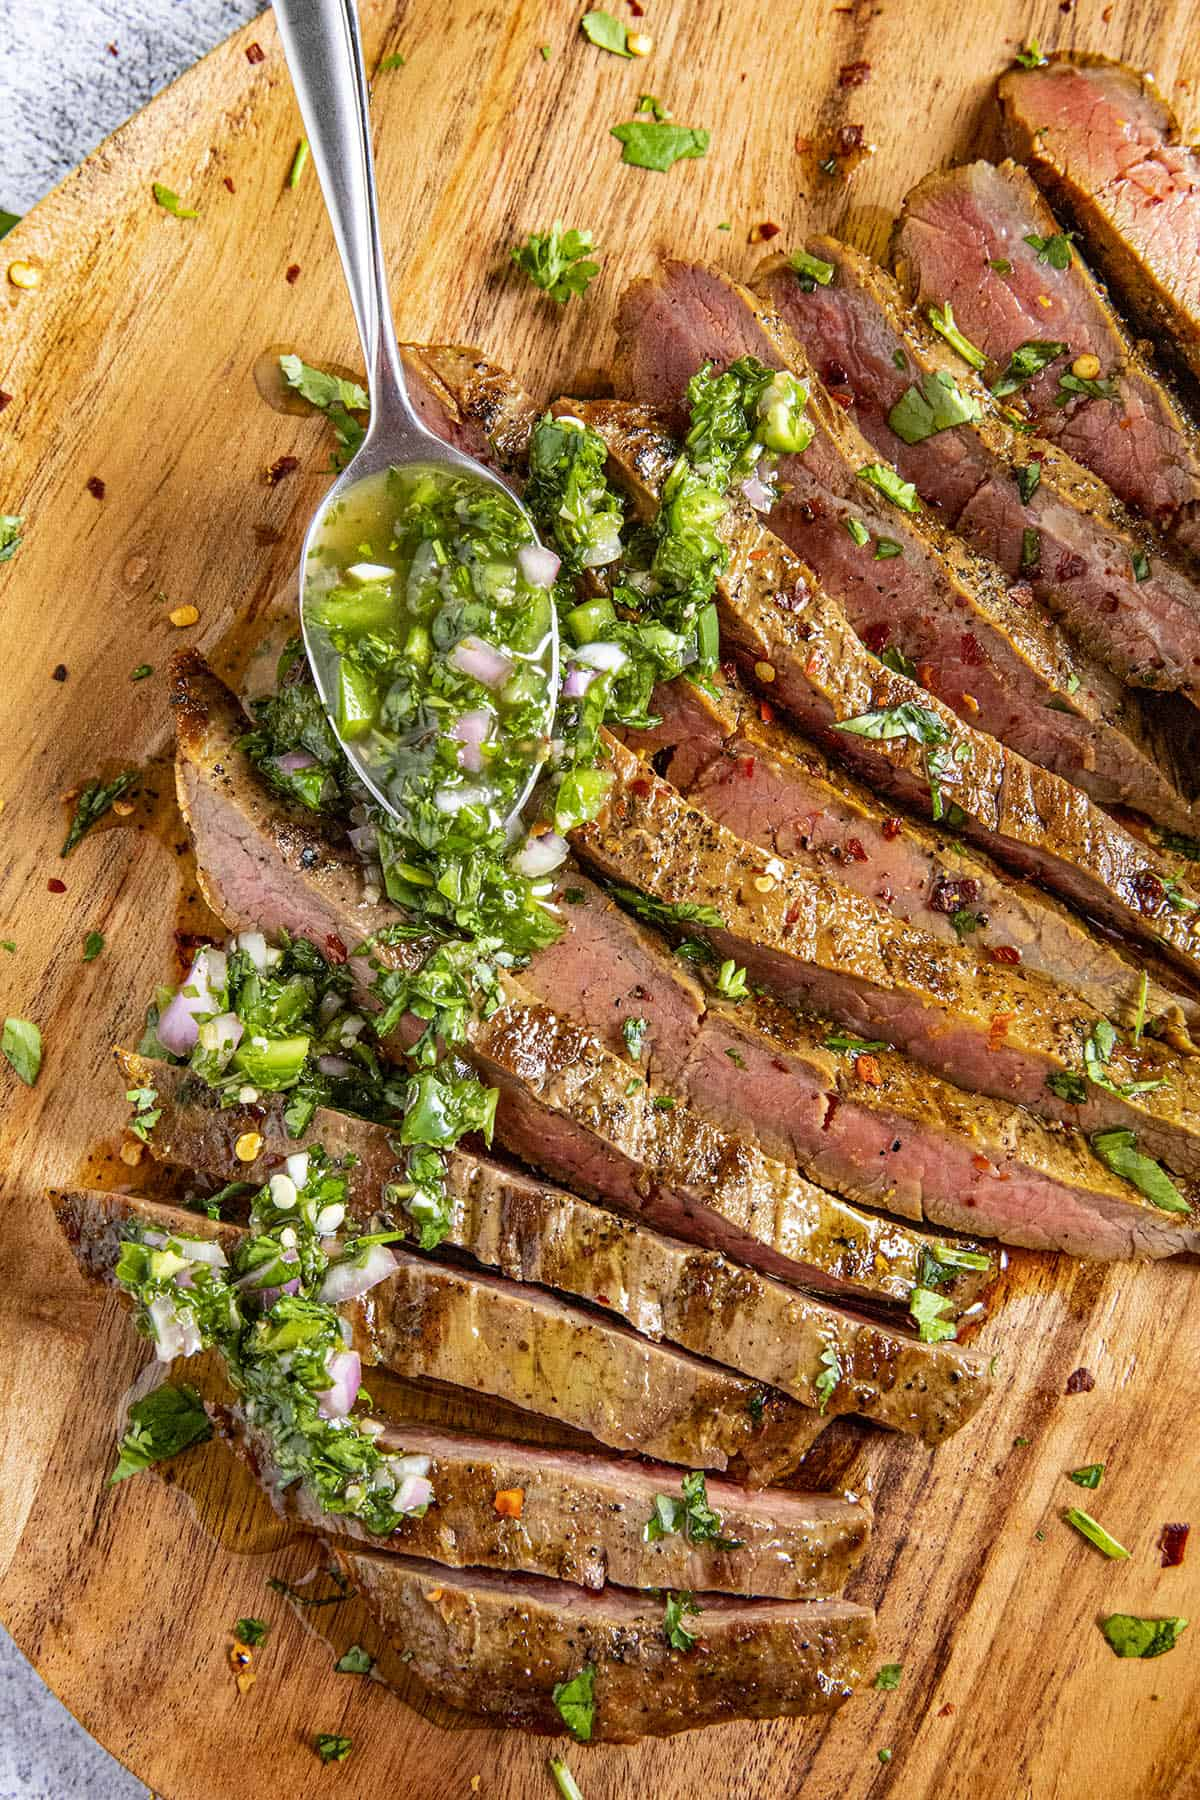 Serving up a platter of Chimichurri Steak